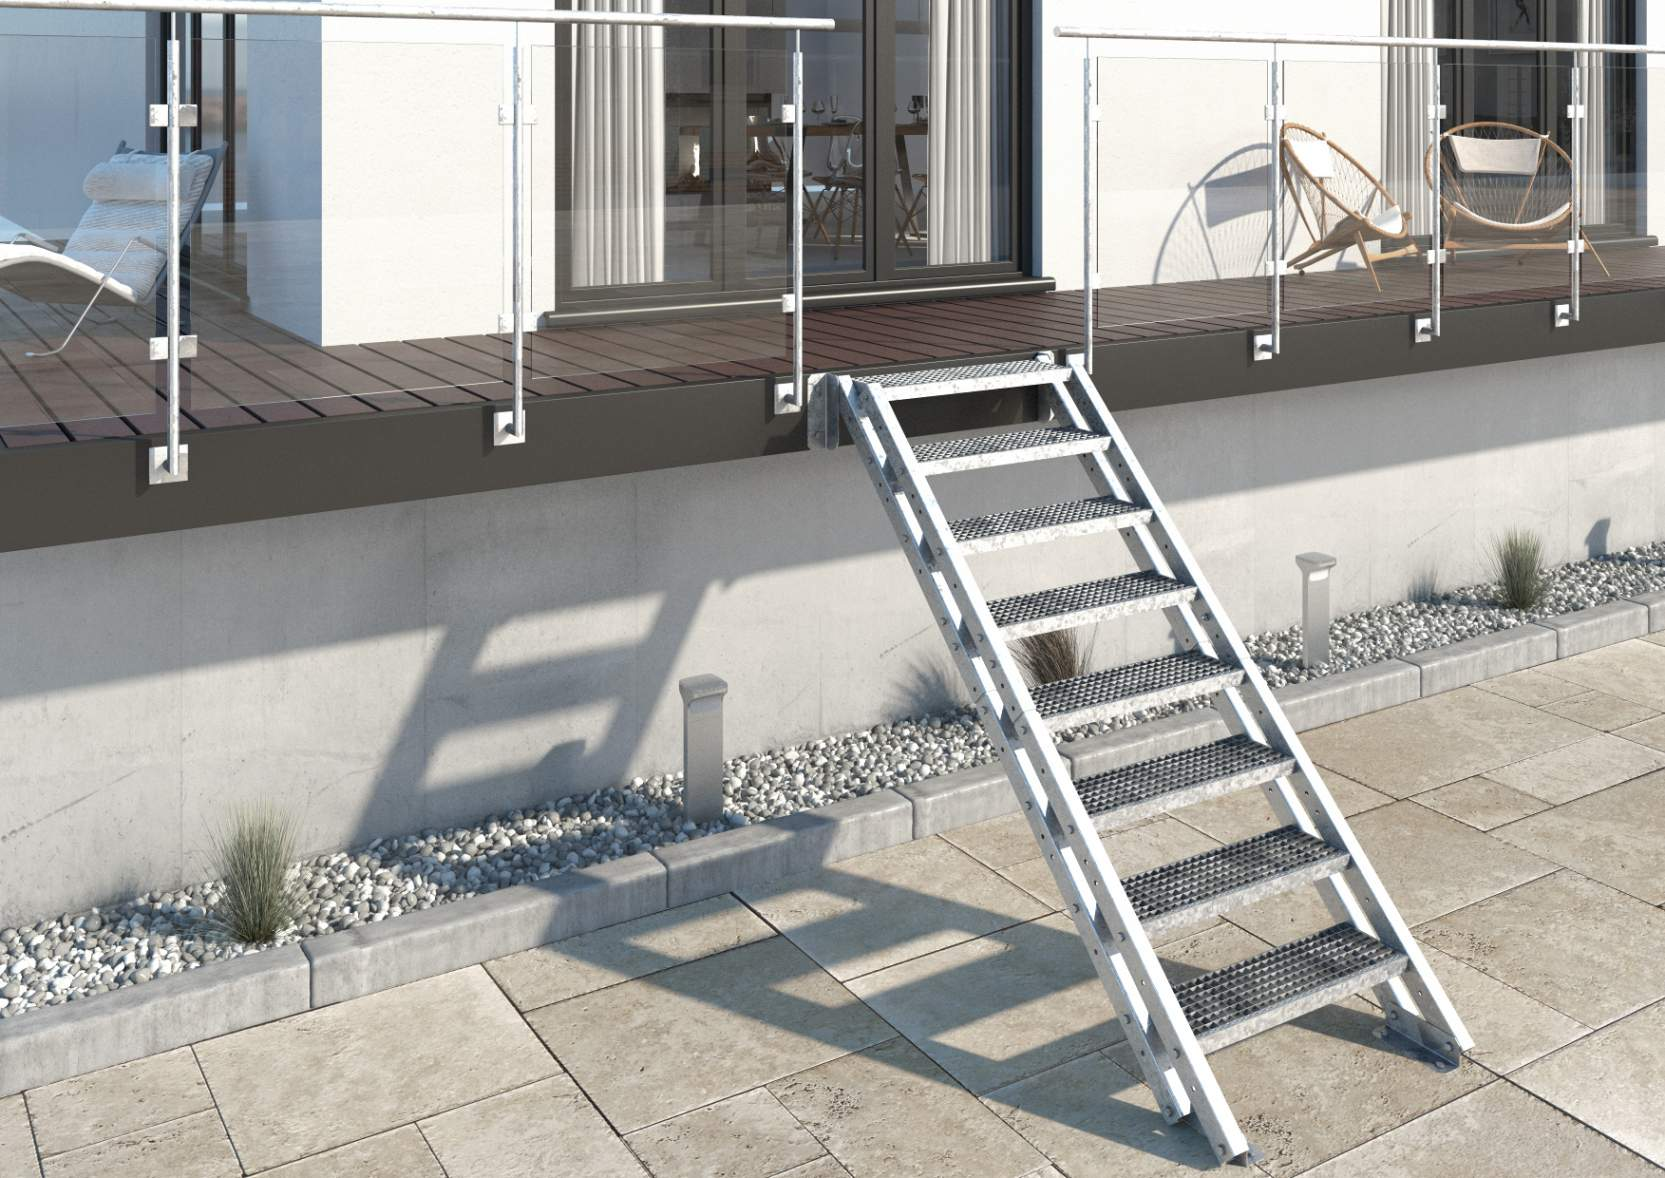 treppe ohne gelander finca ca na pulida mallorca sineu frau doris treppe ohne handlauf erlaubt treppe ohne handlauf erlaubt 1